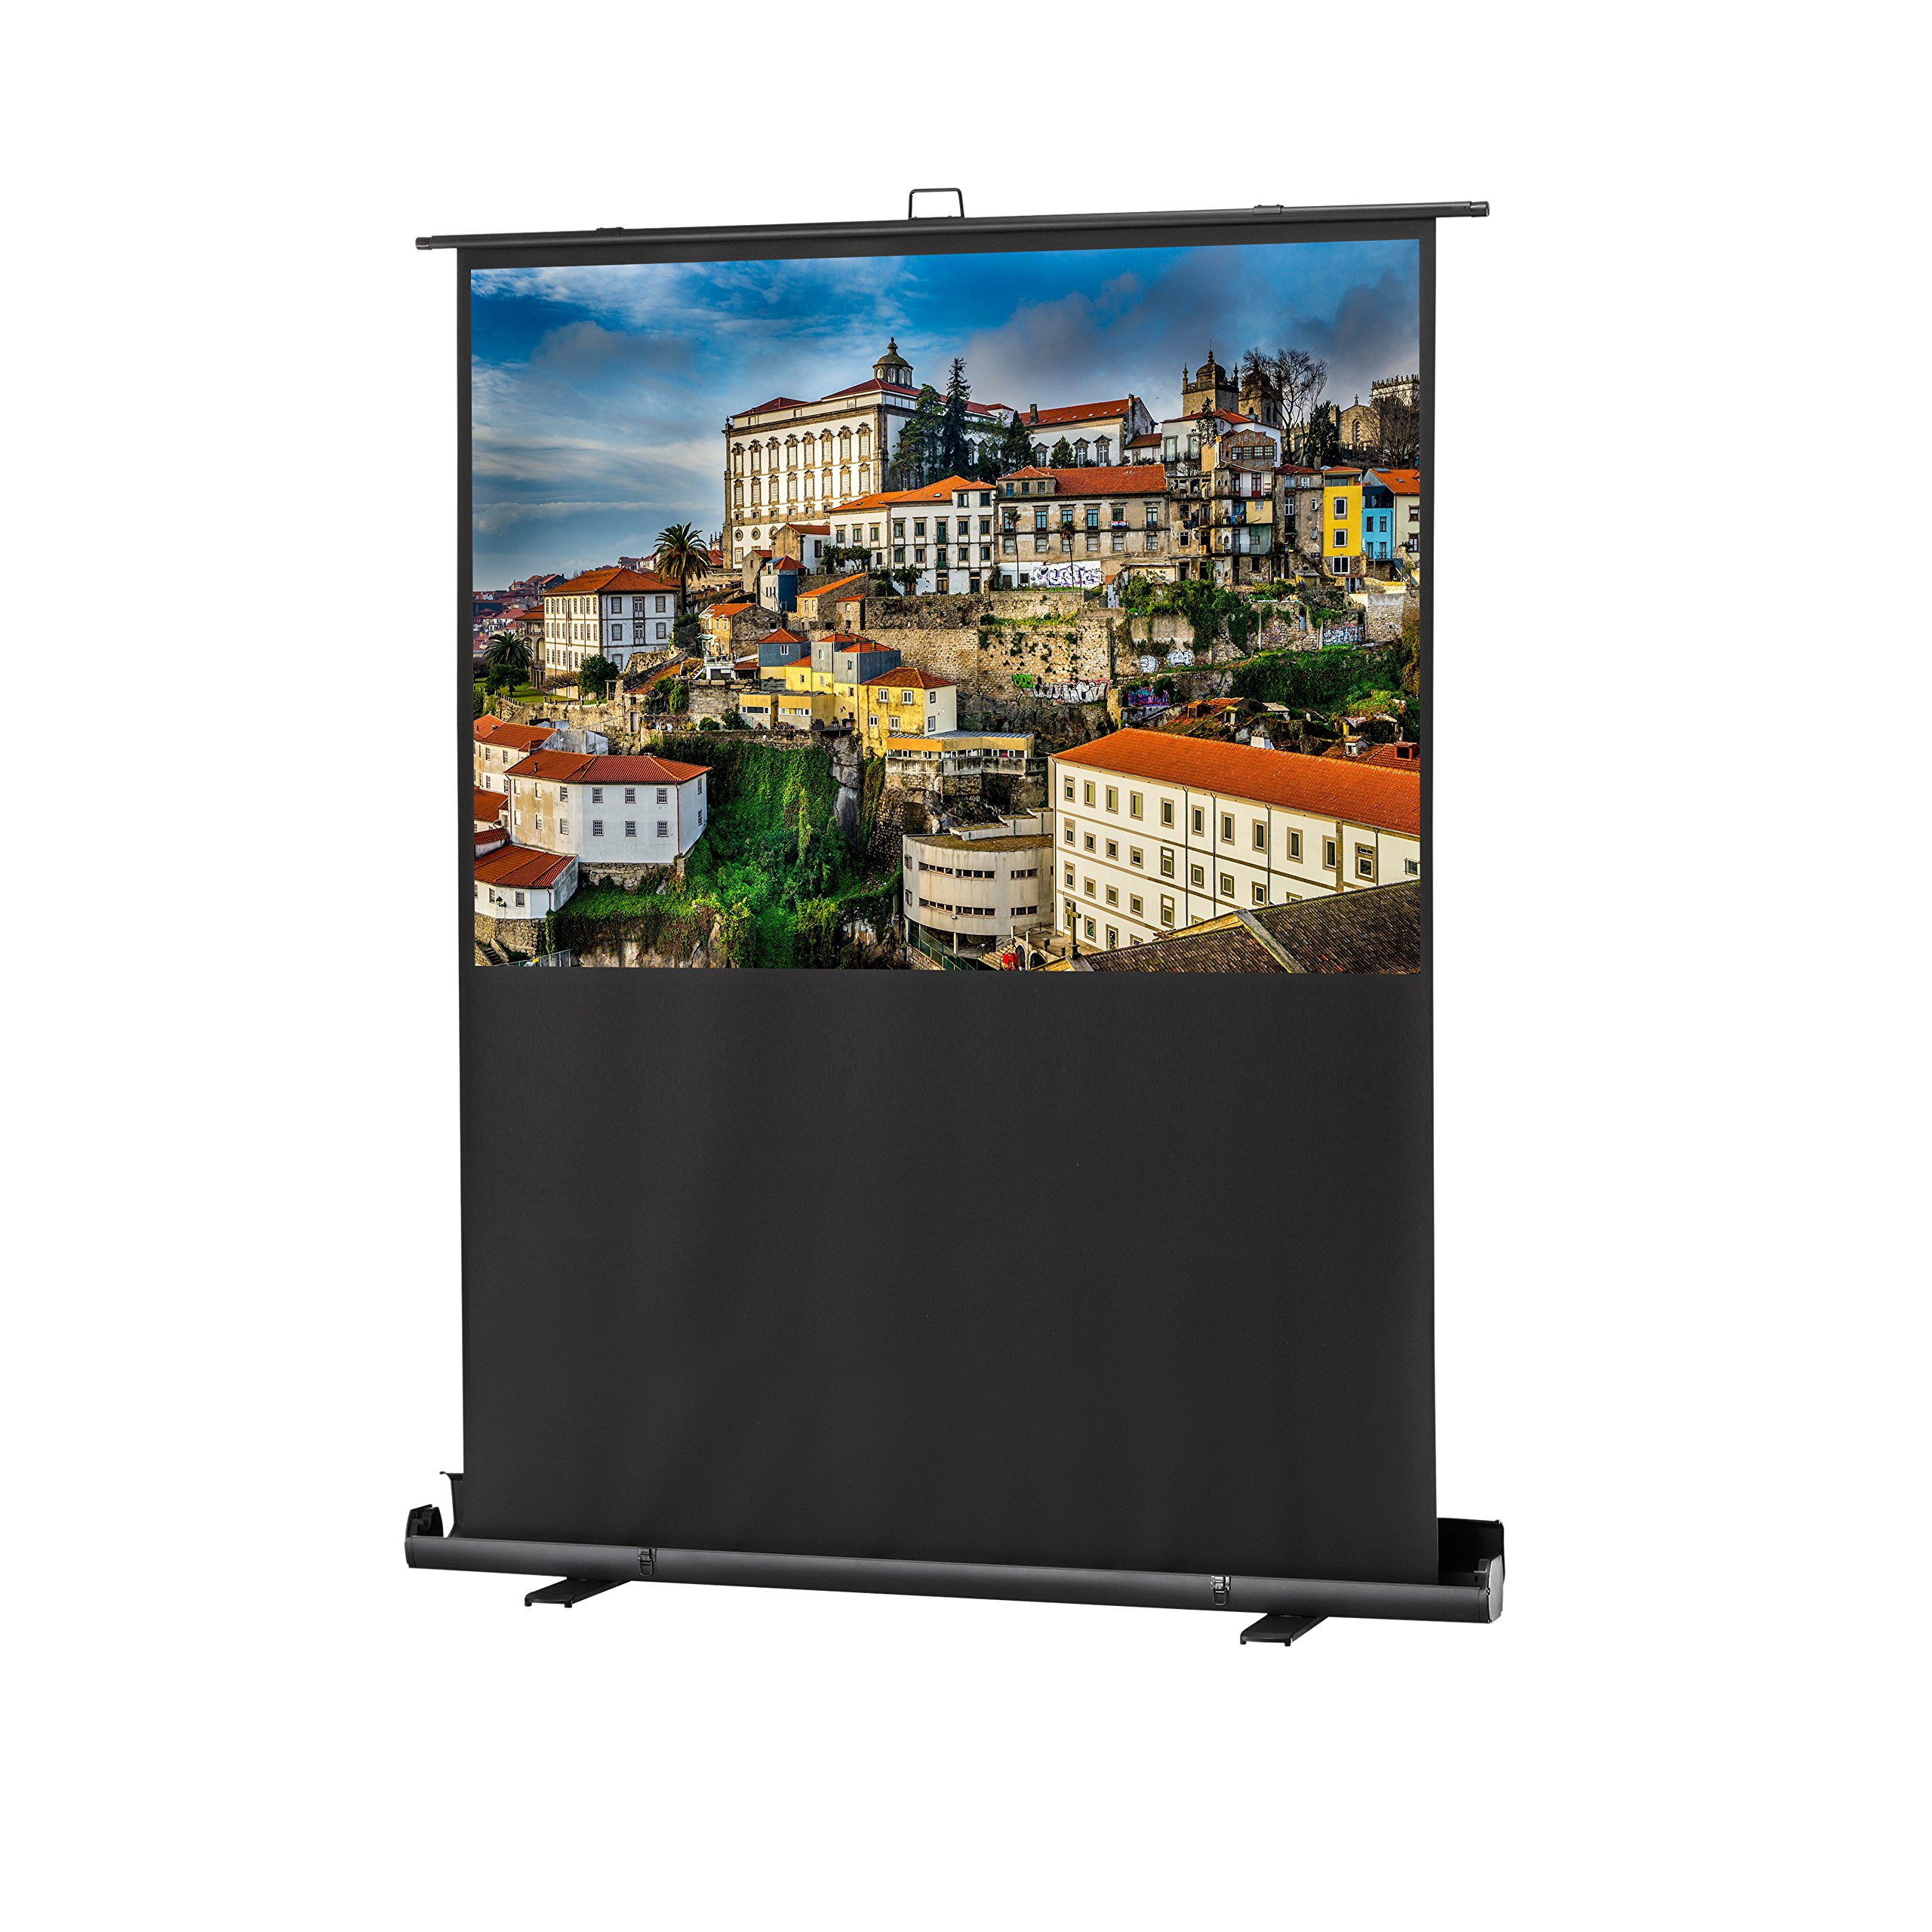 celexon 81'' Pull Up Projector Screen Mobile Professional Plus| 69'' x 39'' Viewing Area | 16:9 format | Portable floor pull up projector screen | Pneumatic Lift | Leightweight aluminium case by celexon